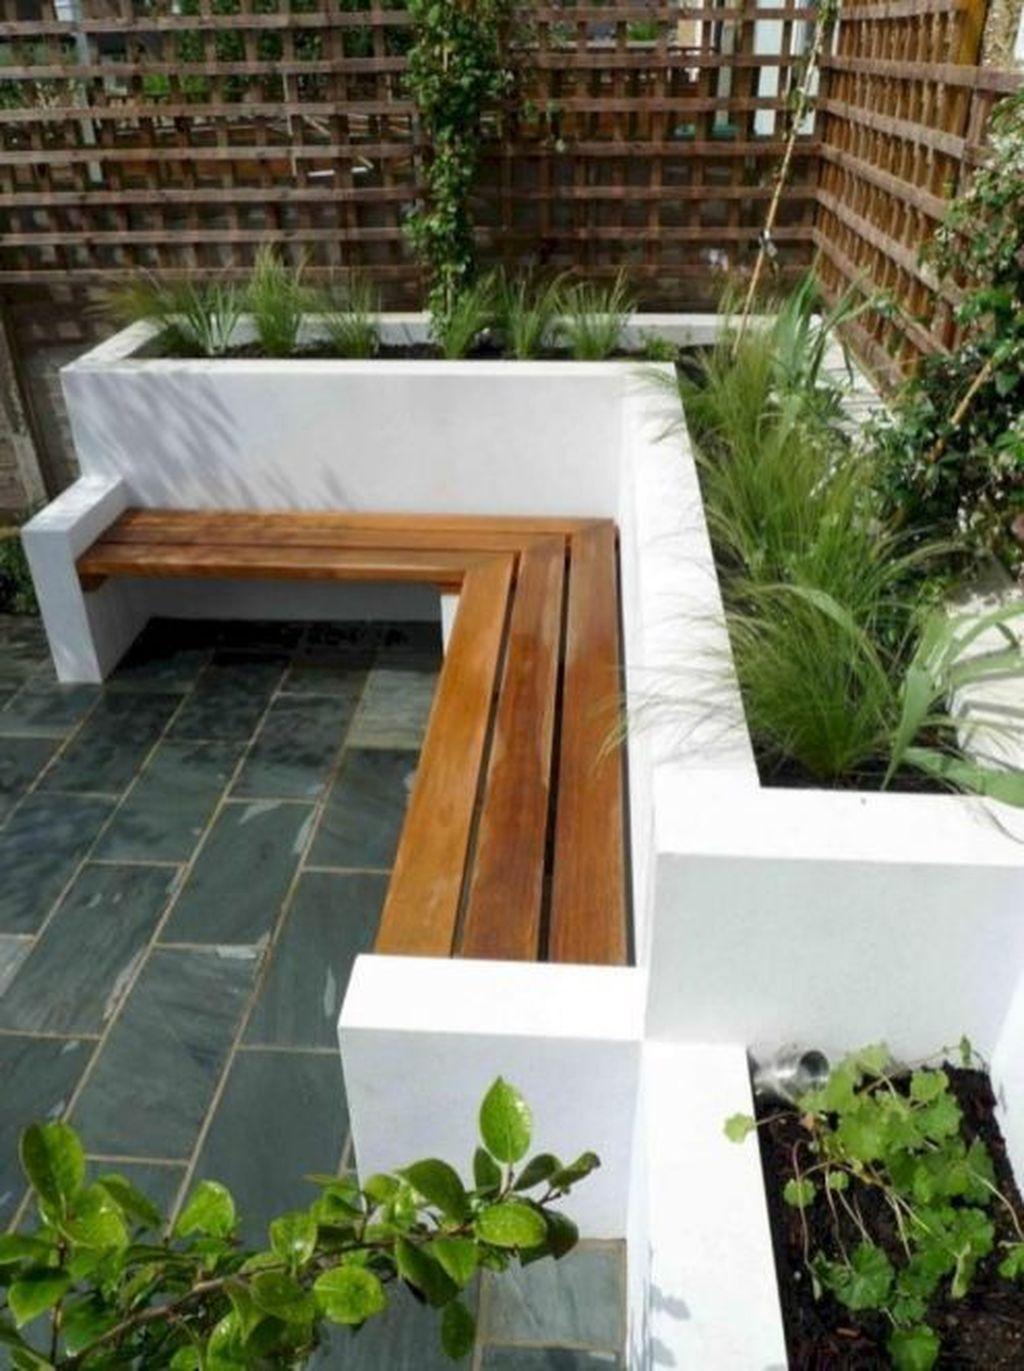 The Best Urban Garden Design Ideas For Your Backyard 14